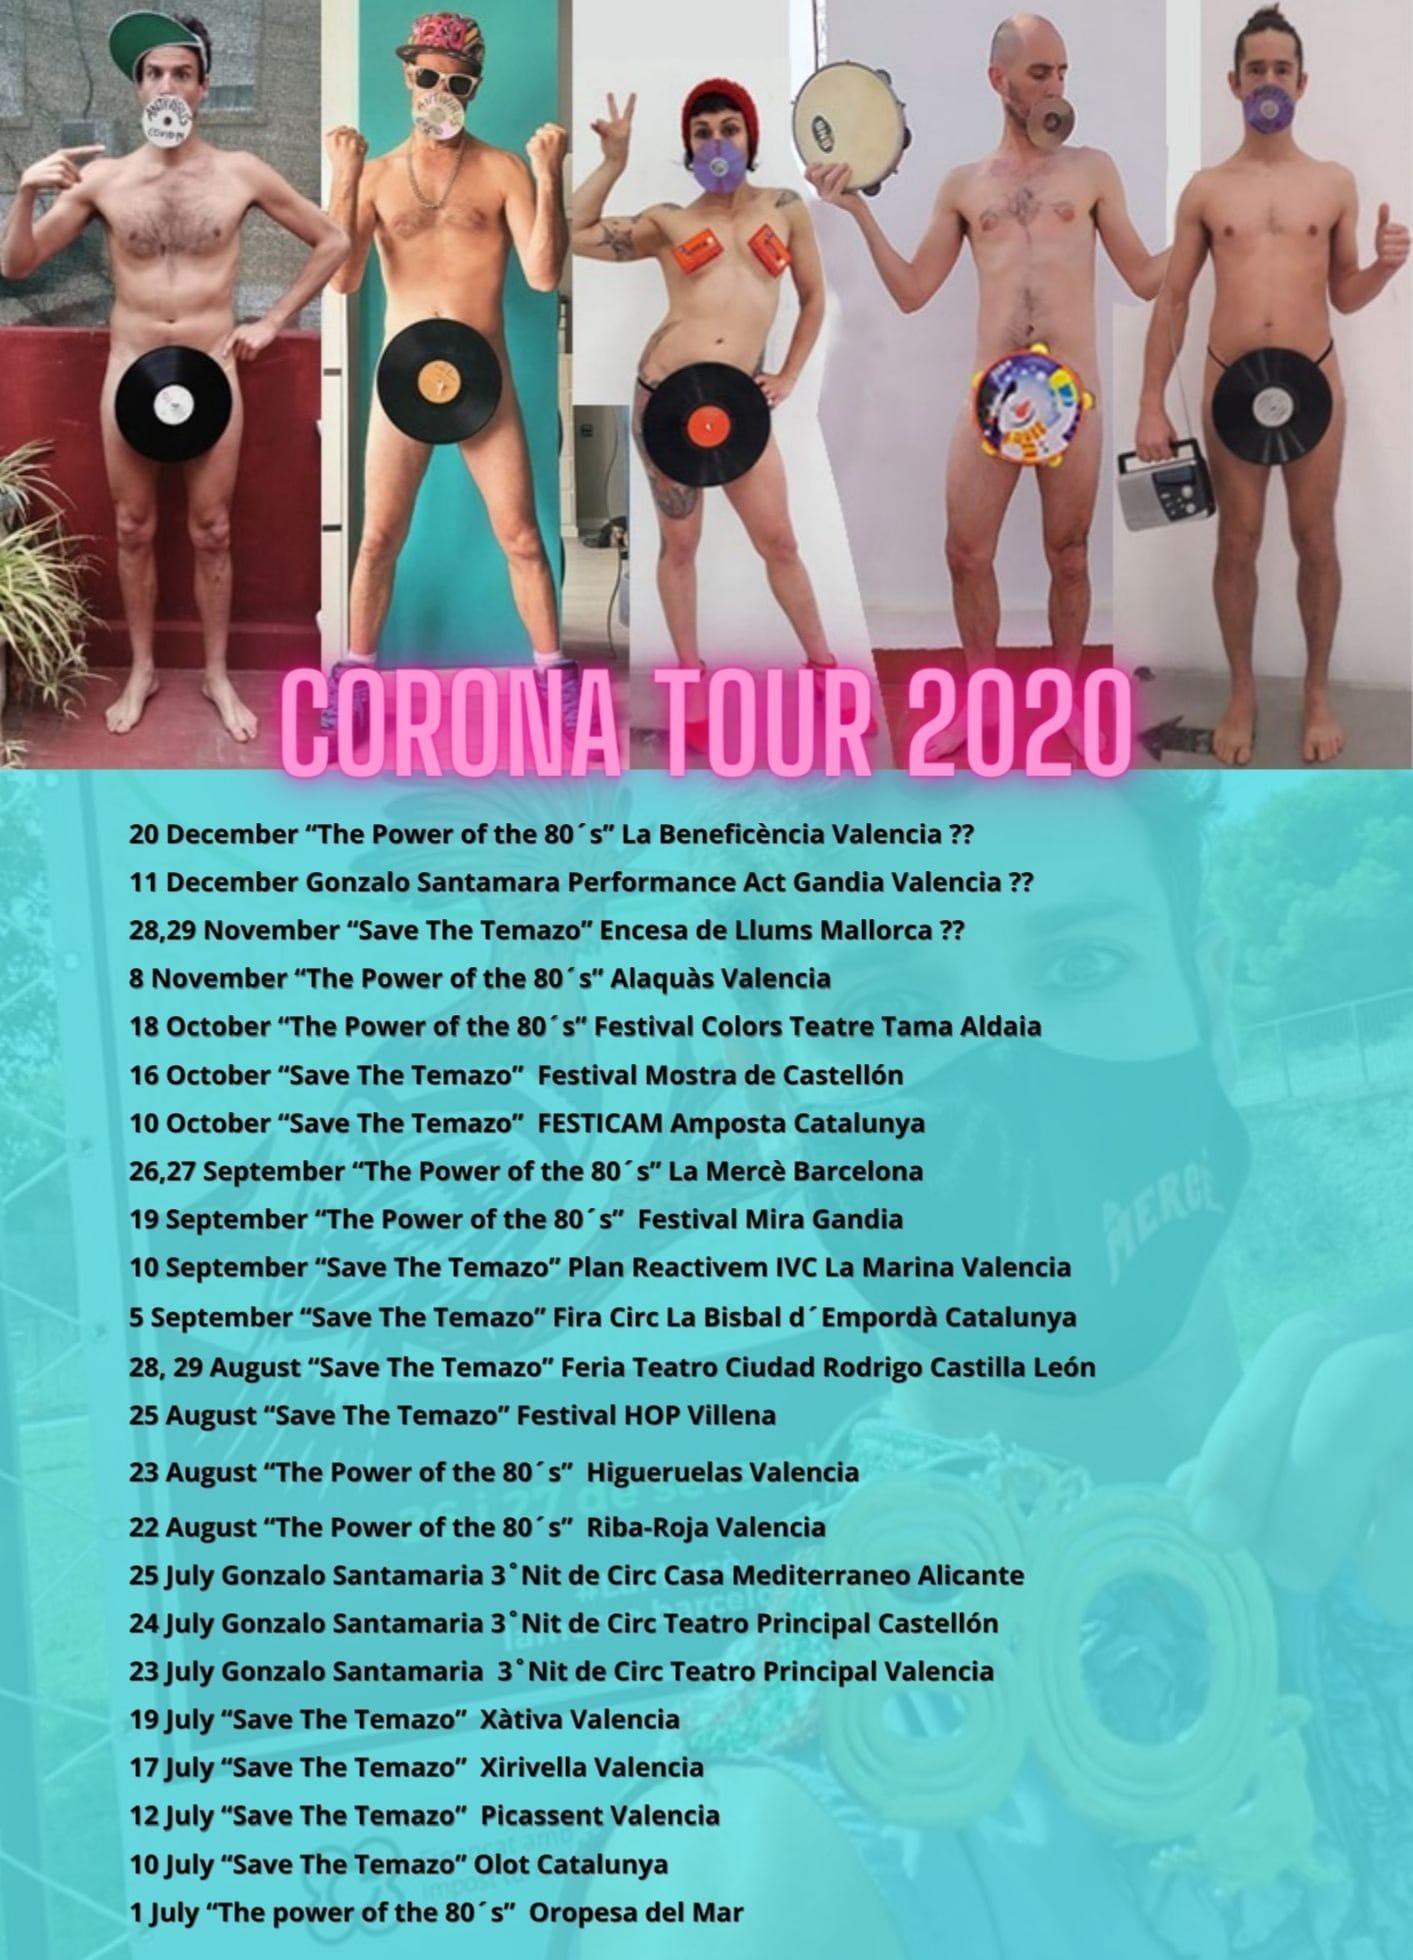 Corona Tour 2020